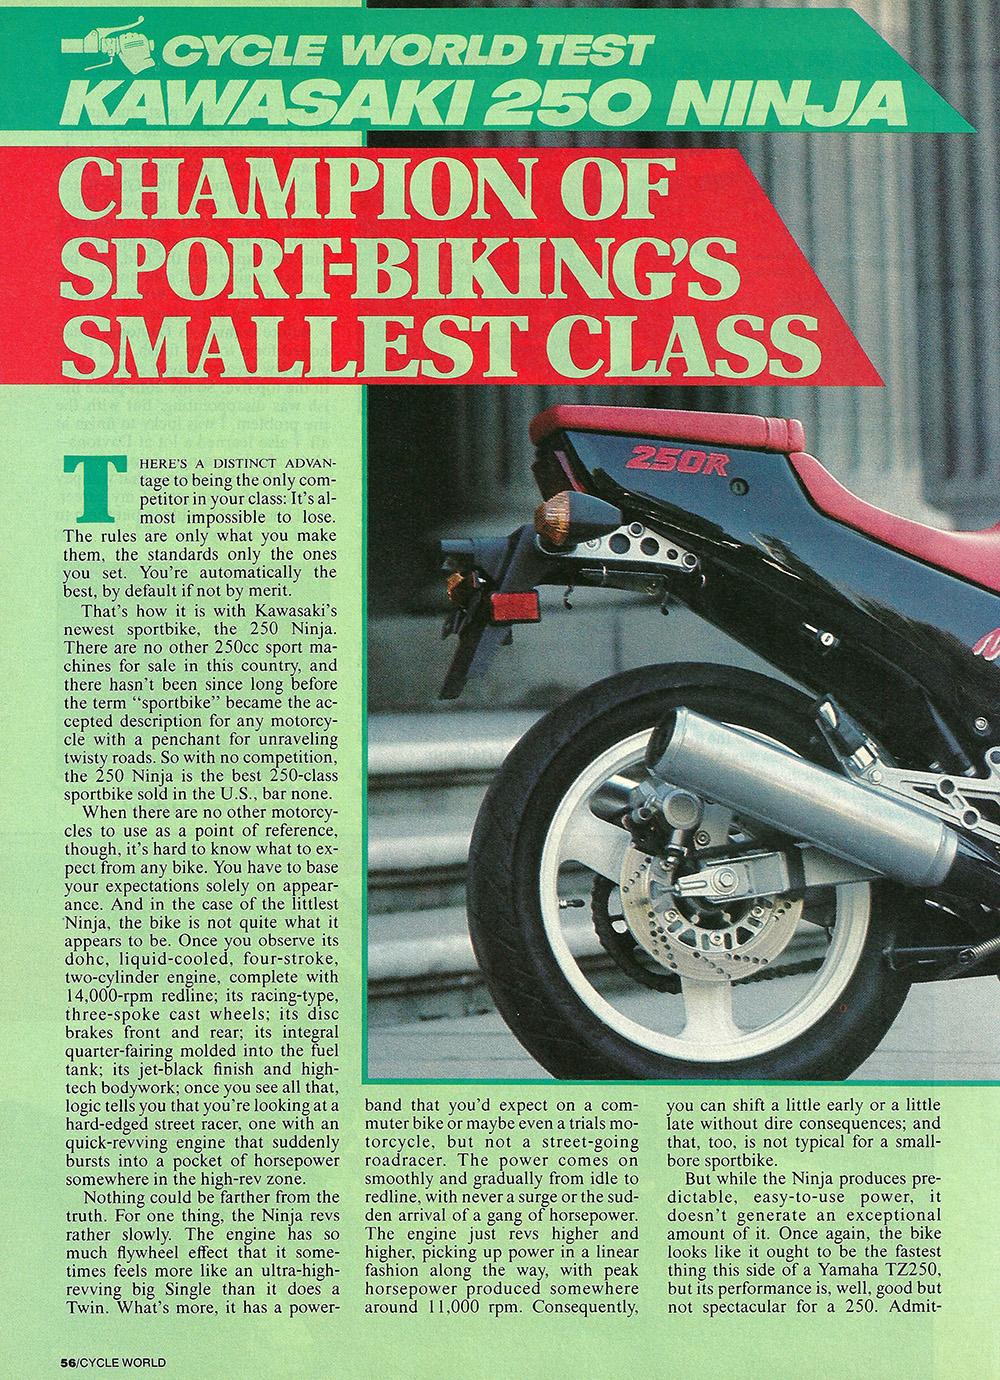 1986 Kawasaki Ninja 250 road test 01.jpg